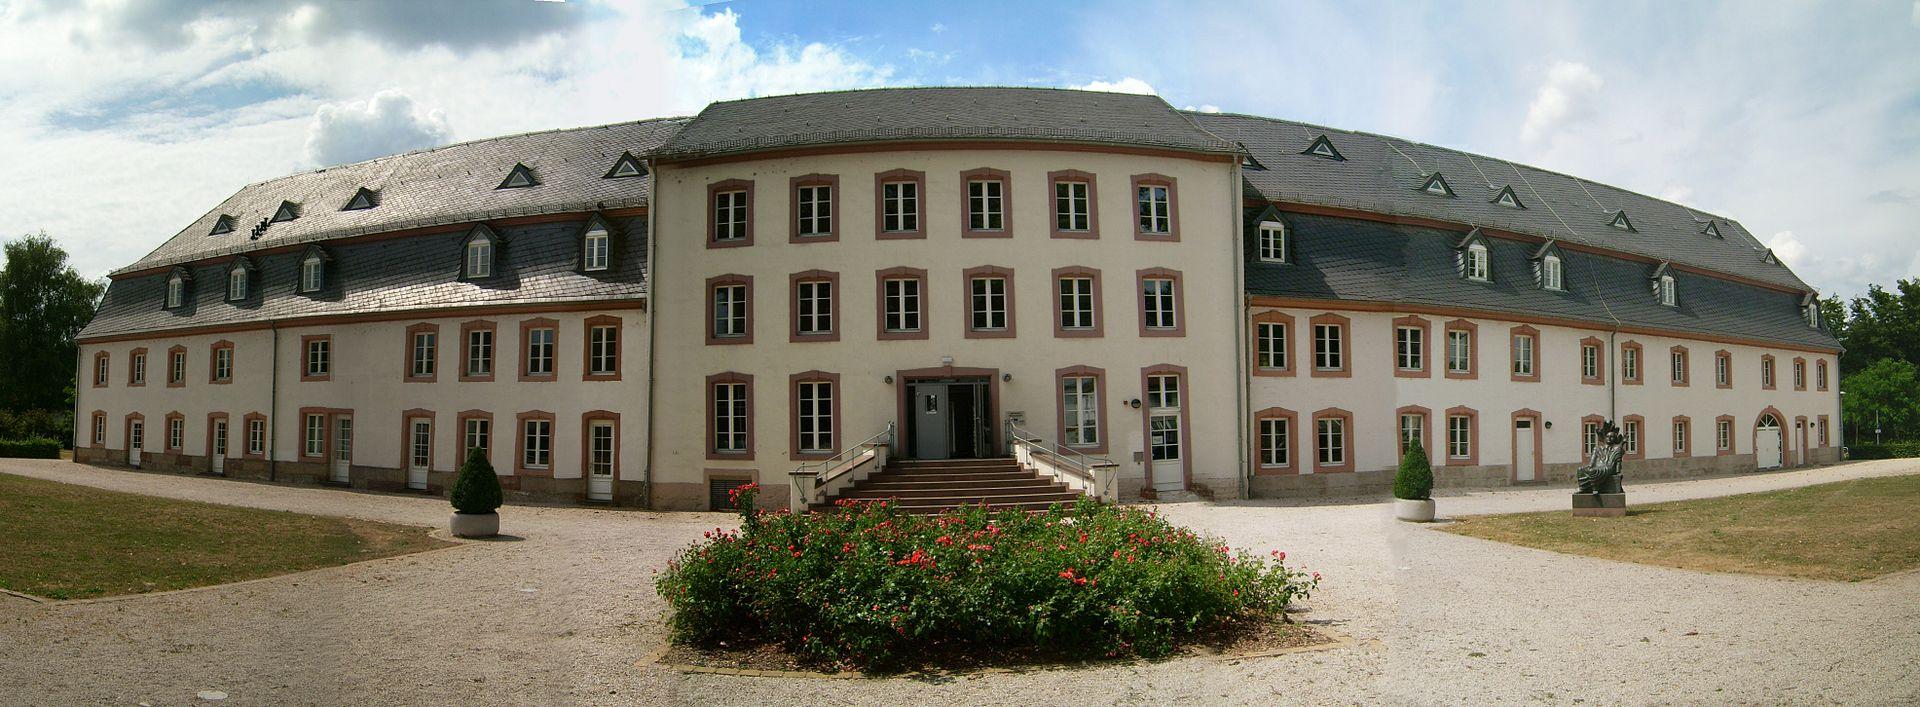 Bild Deutsches Zeitungsmuseum Wadgassen